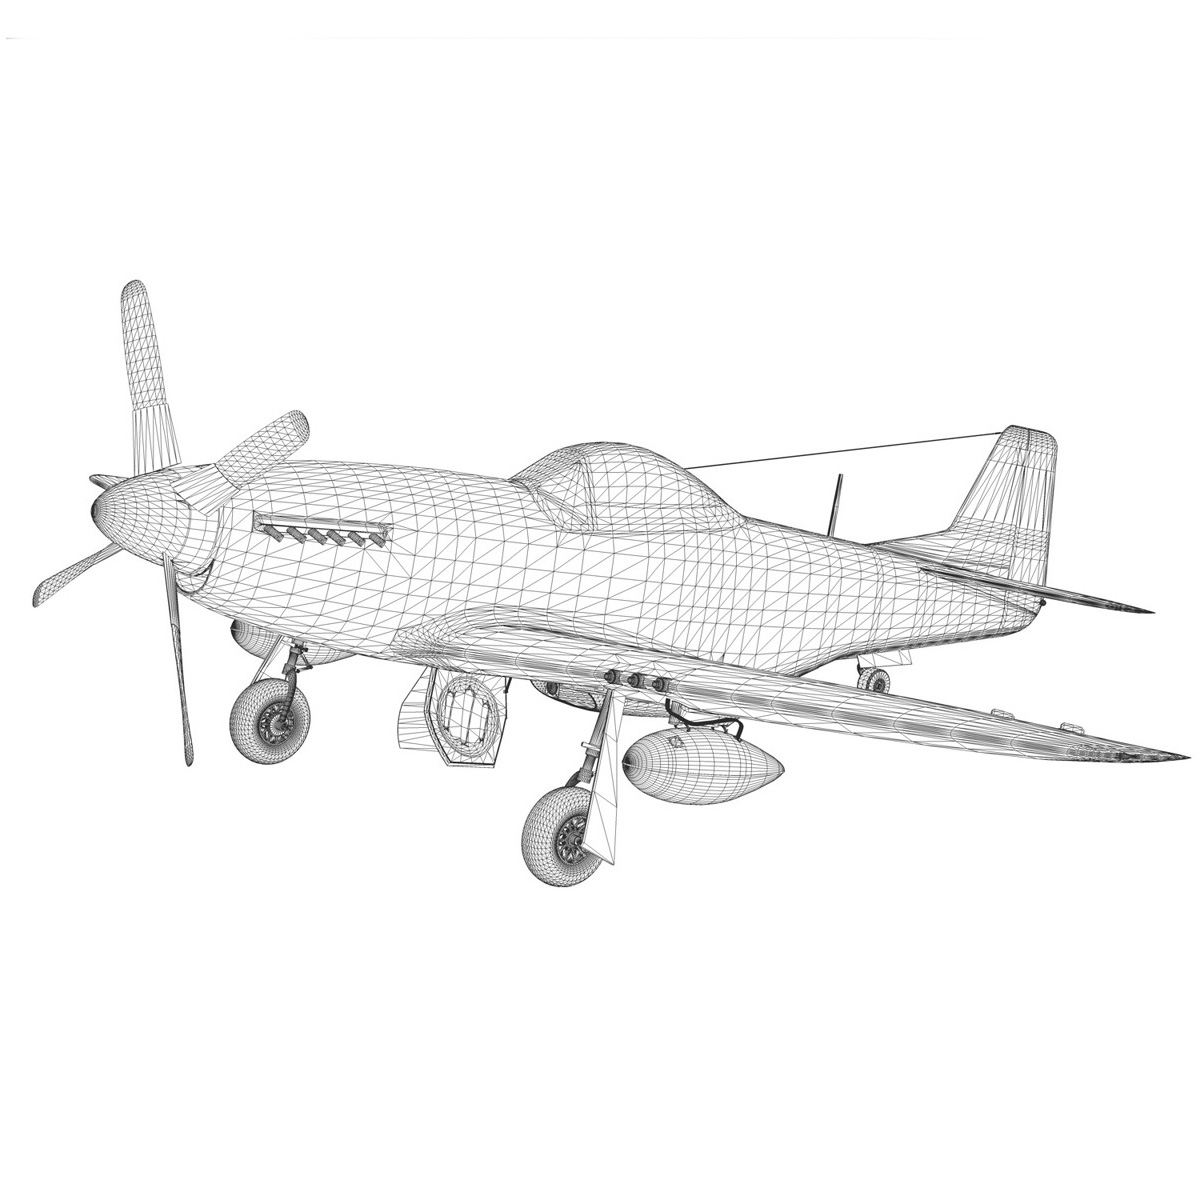 north american p-51d mustang – stinky 3d model fbx c4d lwo obj 269614